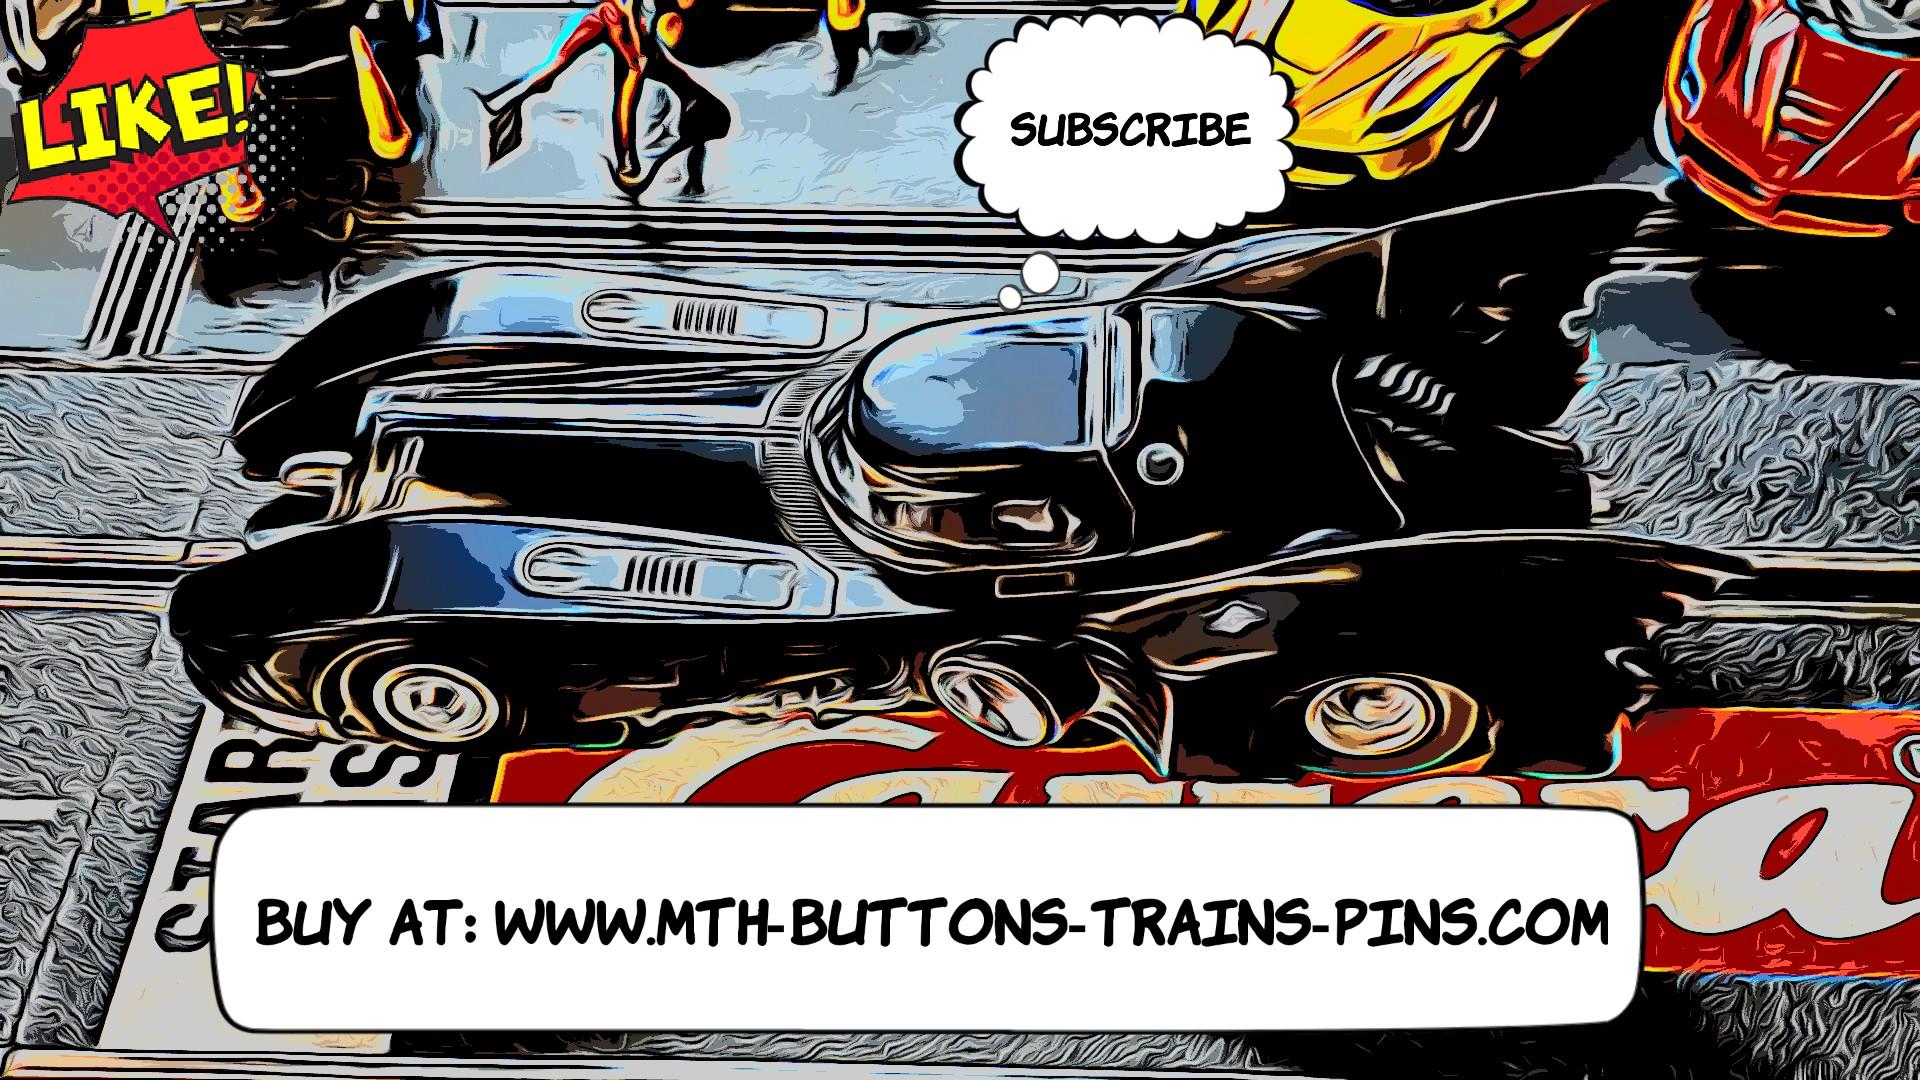 Batman Batmobile Slot Car Rare Limited Edition Movie Series 1:24 Scale